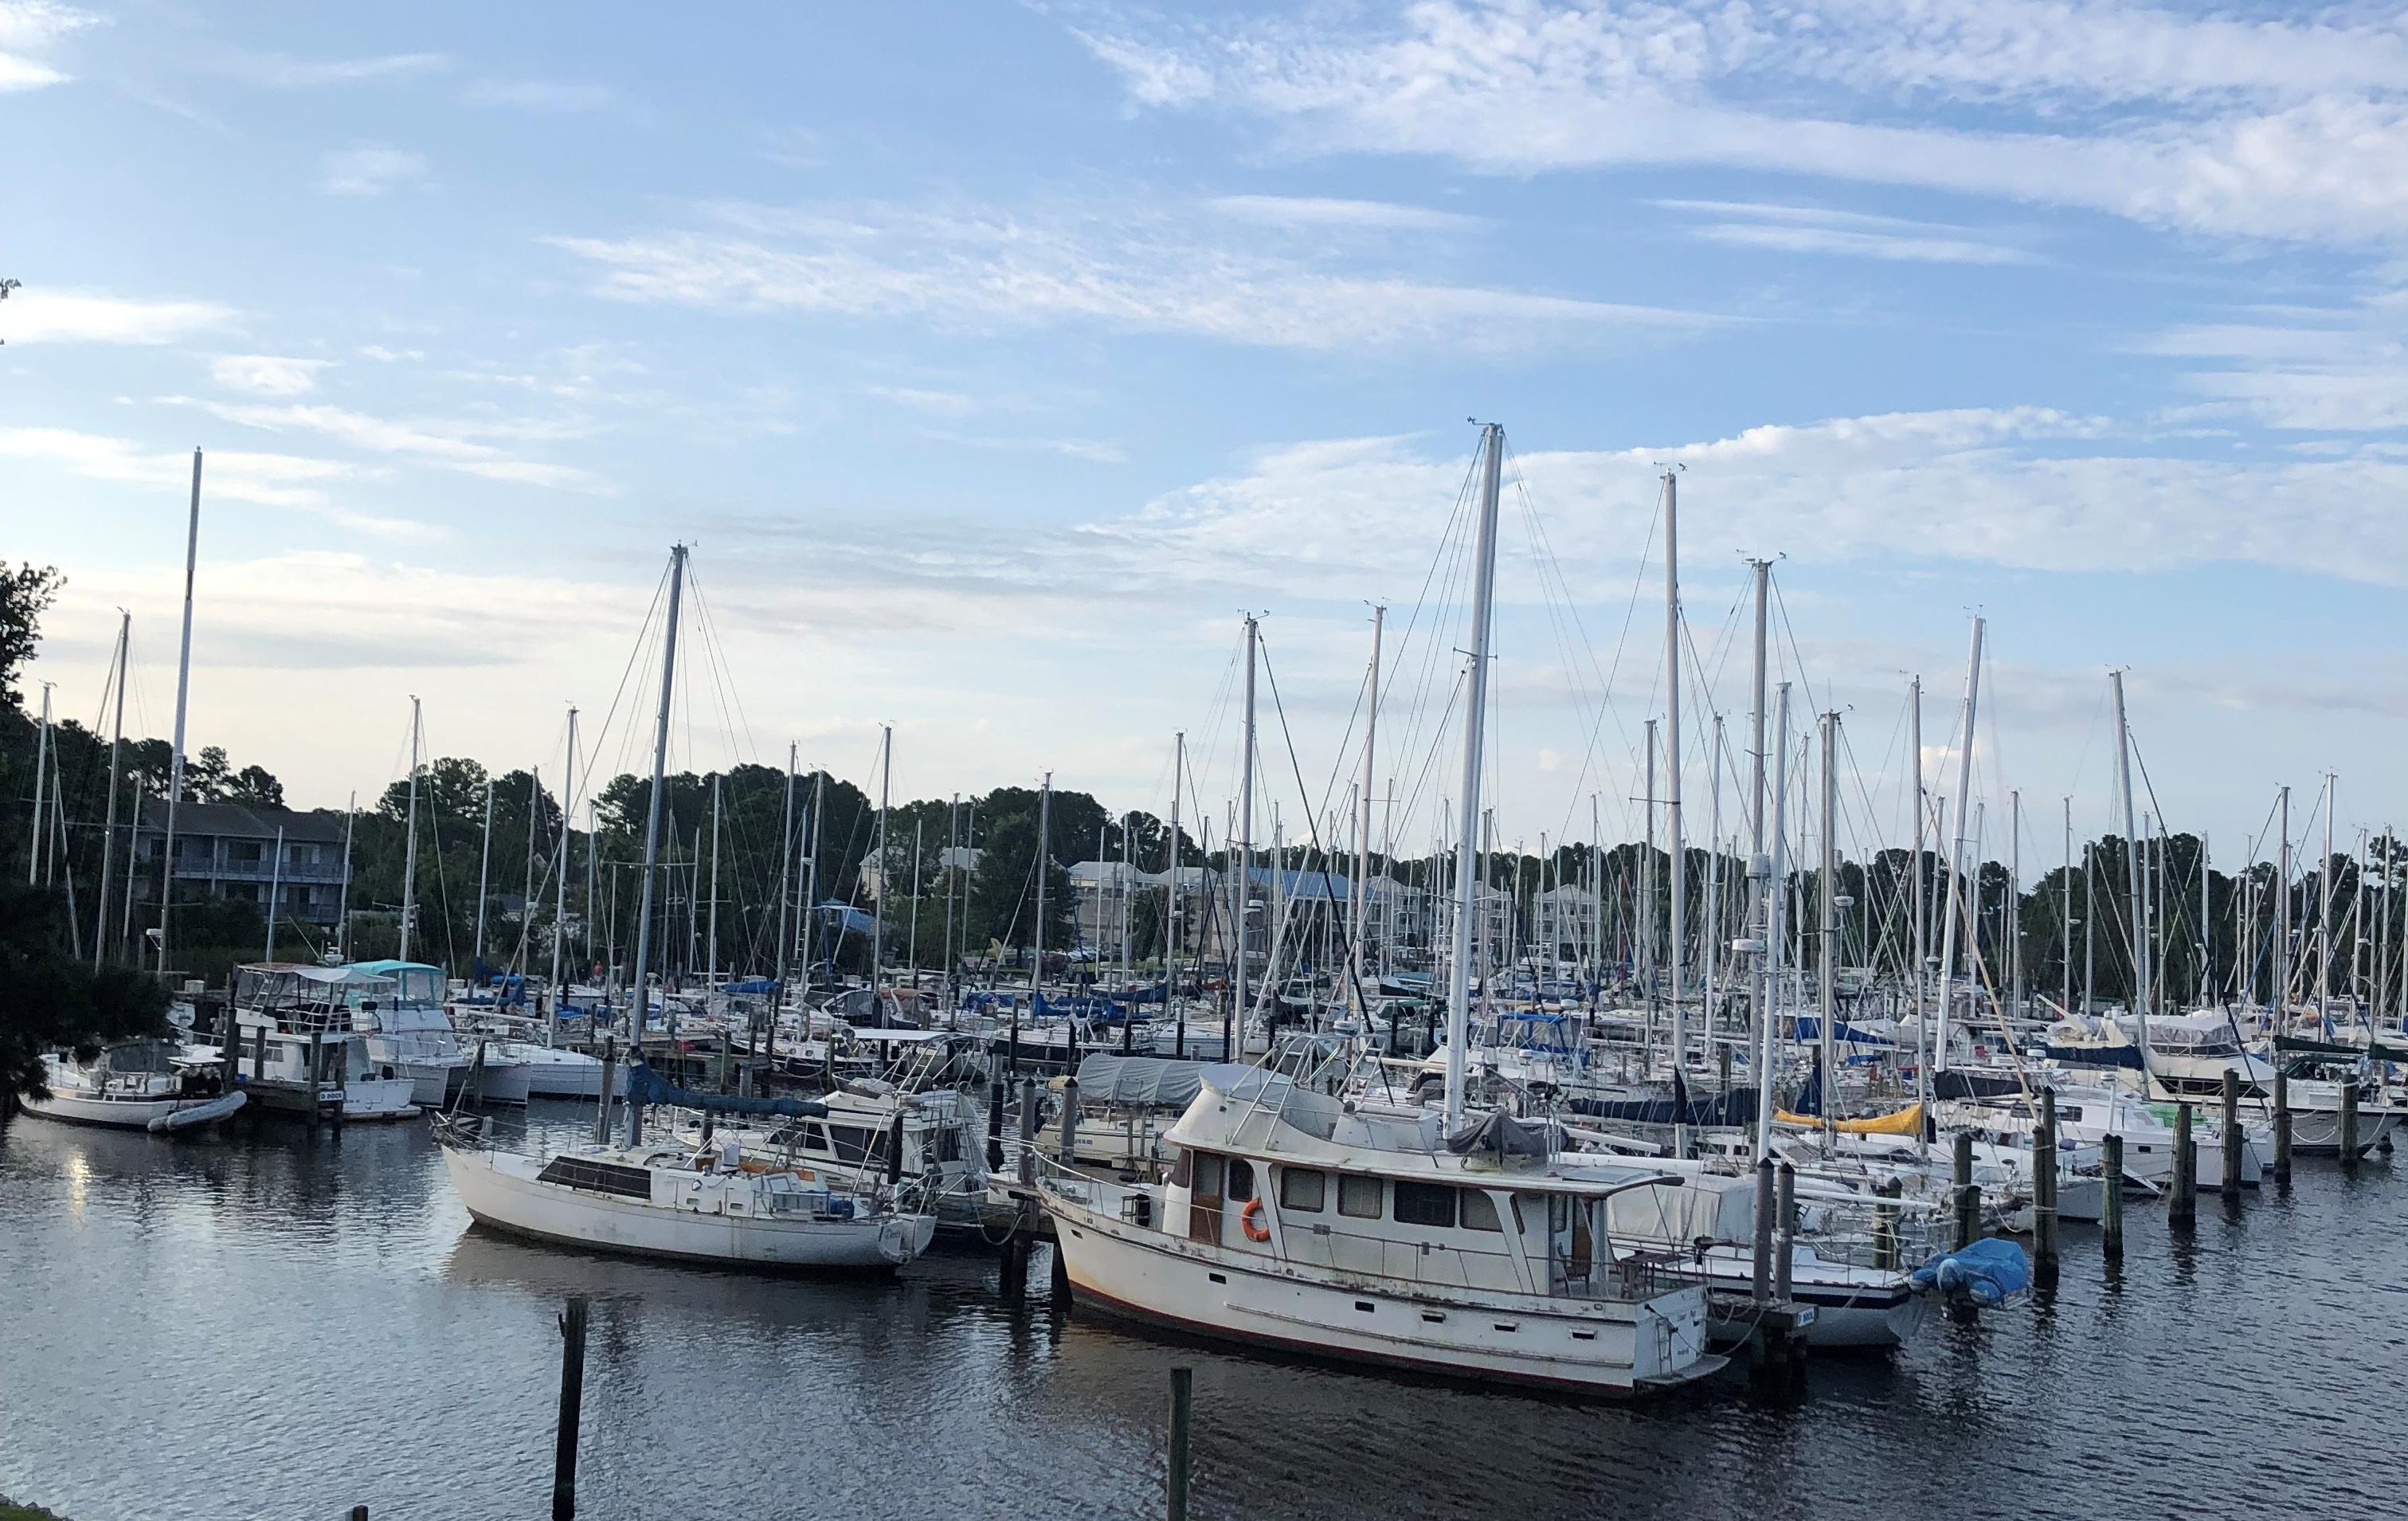 This image shows boats in a harbor in Carolina Beach, North Carolina.